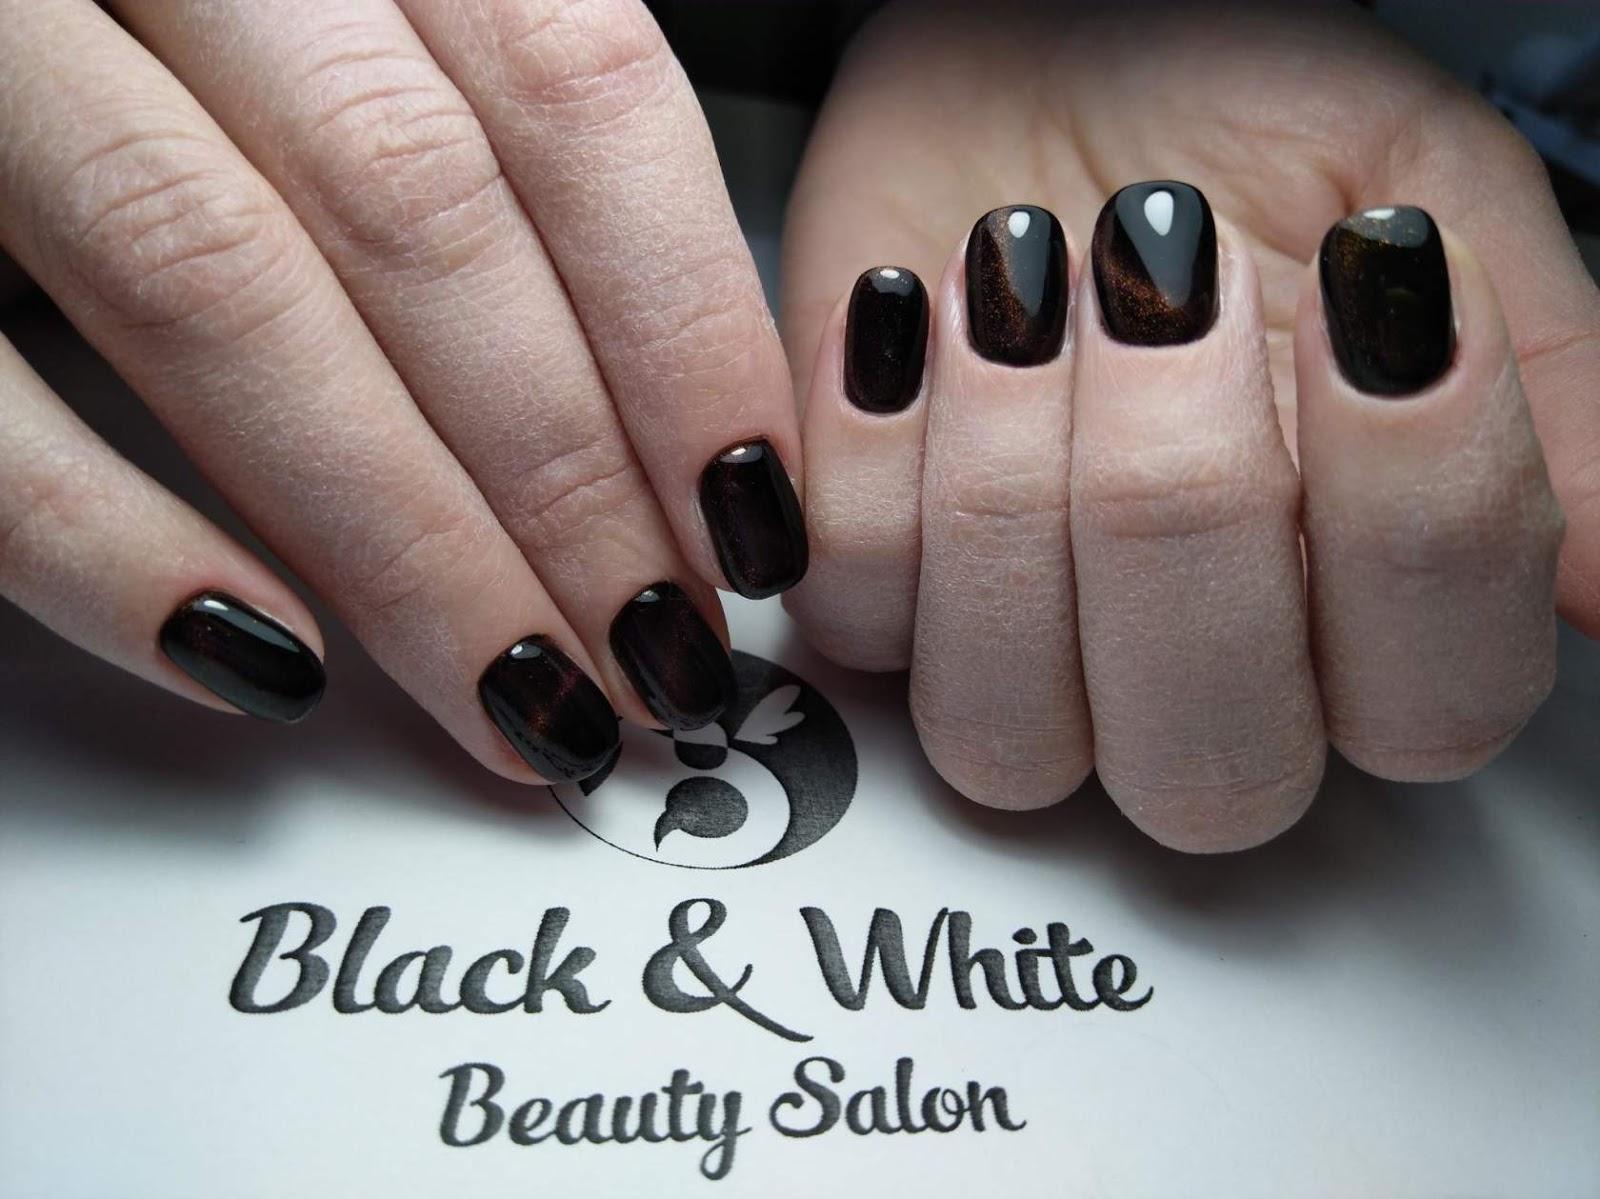 Black & White Nails Art Disign: Broken Nine Inch Nails Torrent